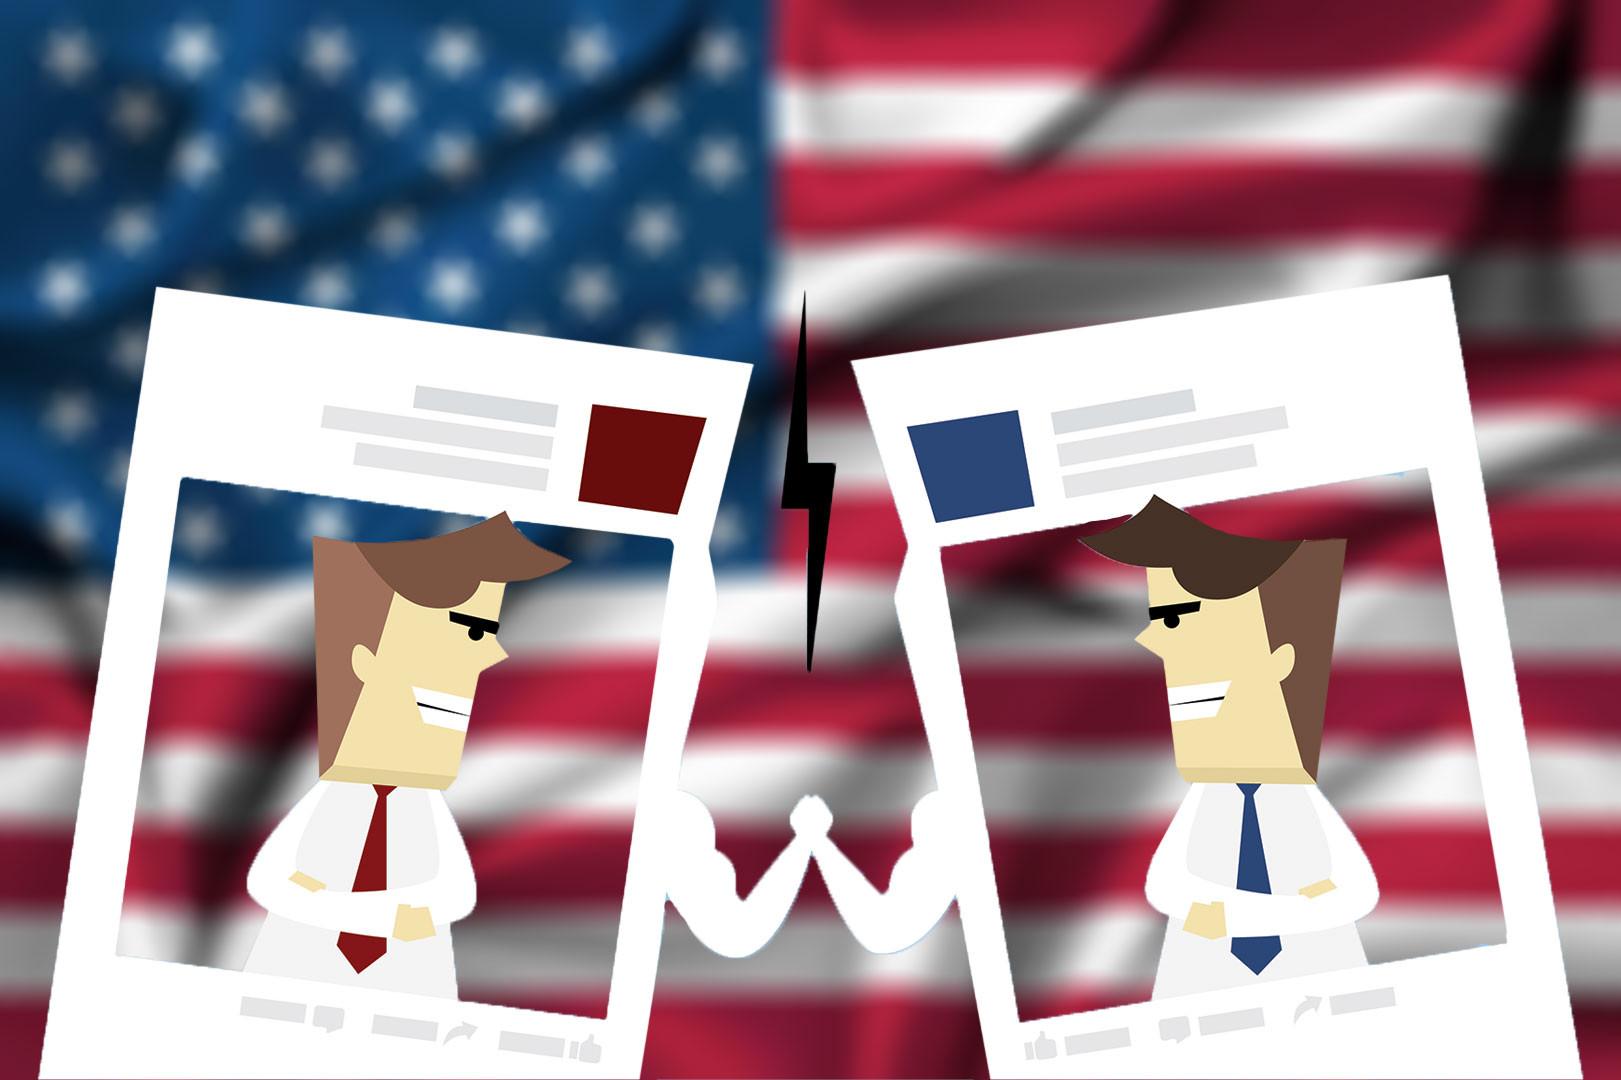 <p>Фото: &copy;&nbsp;Shutterstock.com</p>